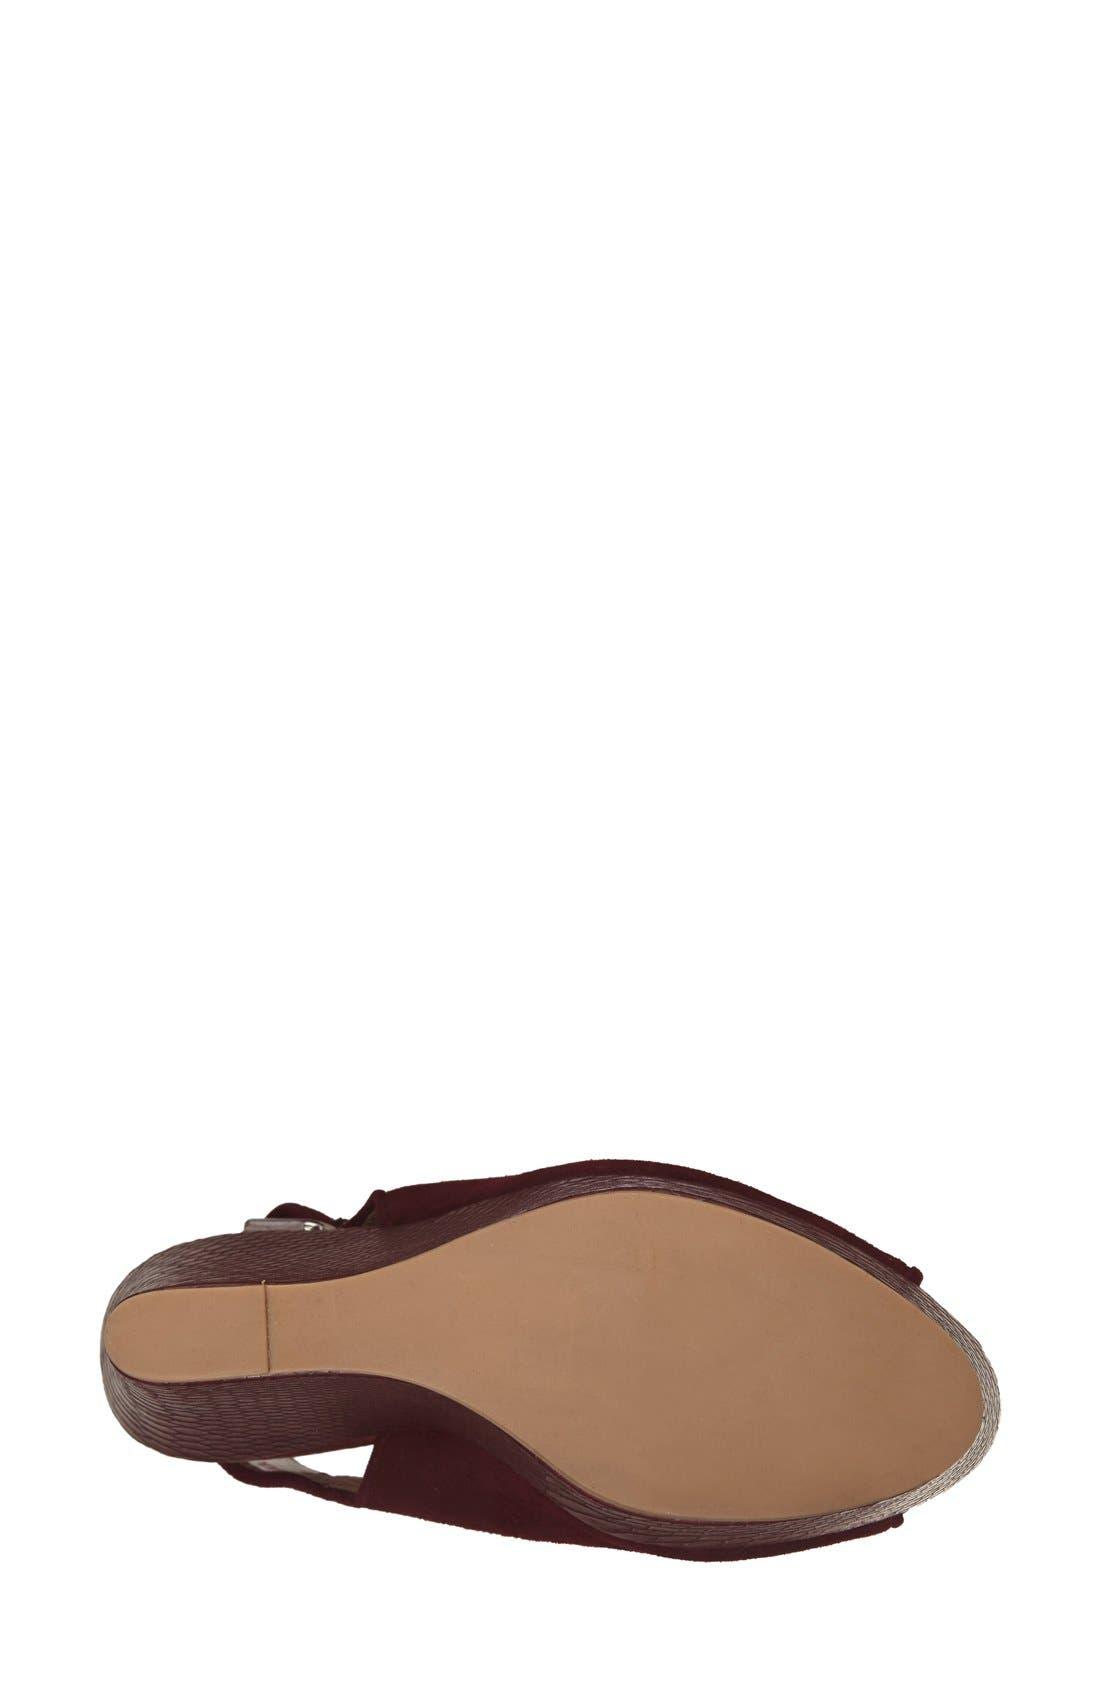 Alternate Image 4  - Jeffrey Campbell 'Dexter' Wedge Sandal (Women)